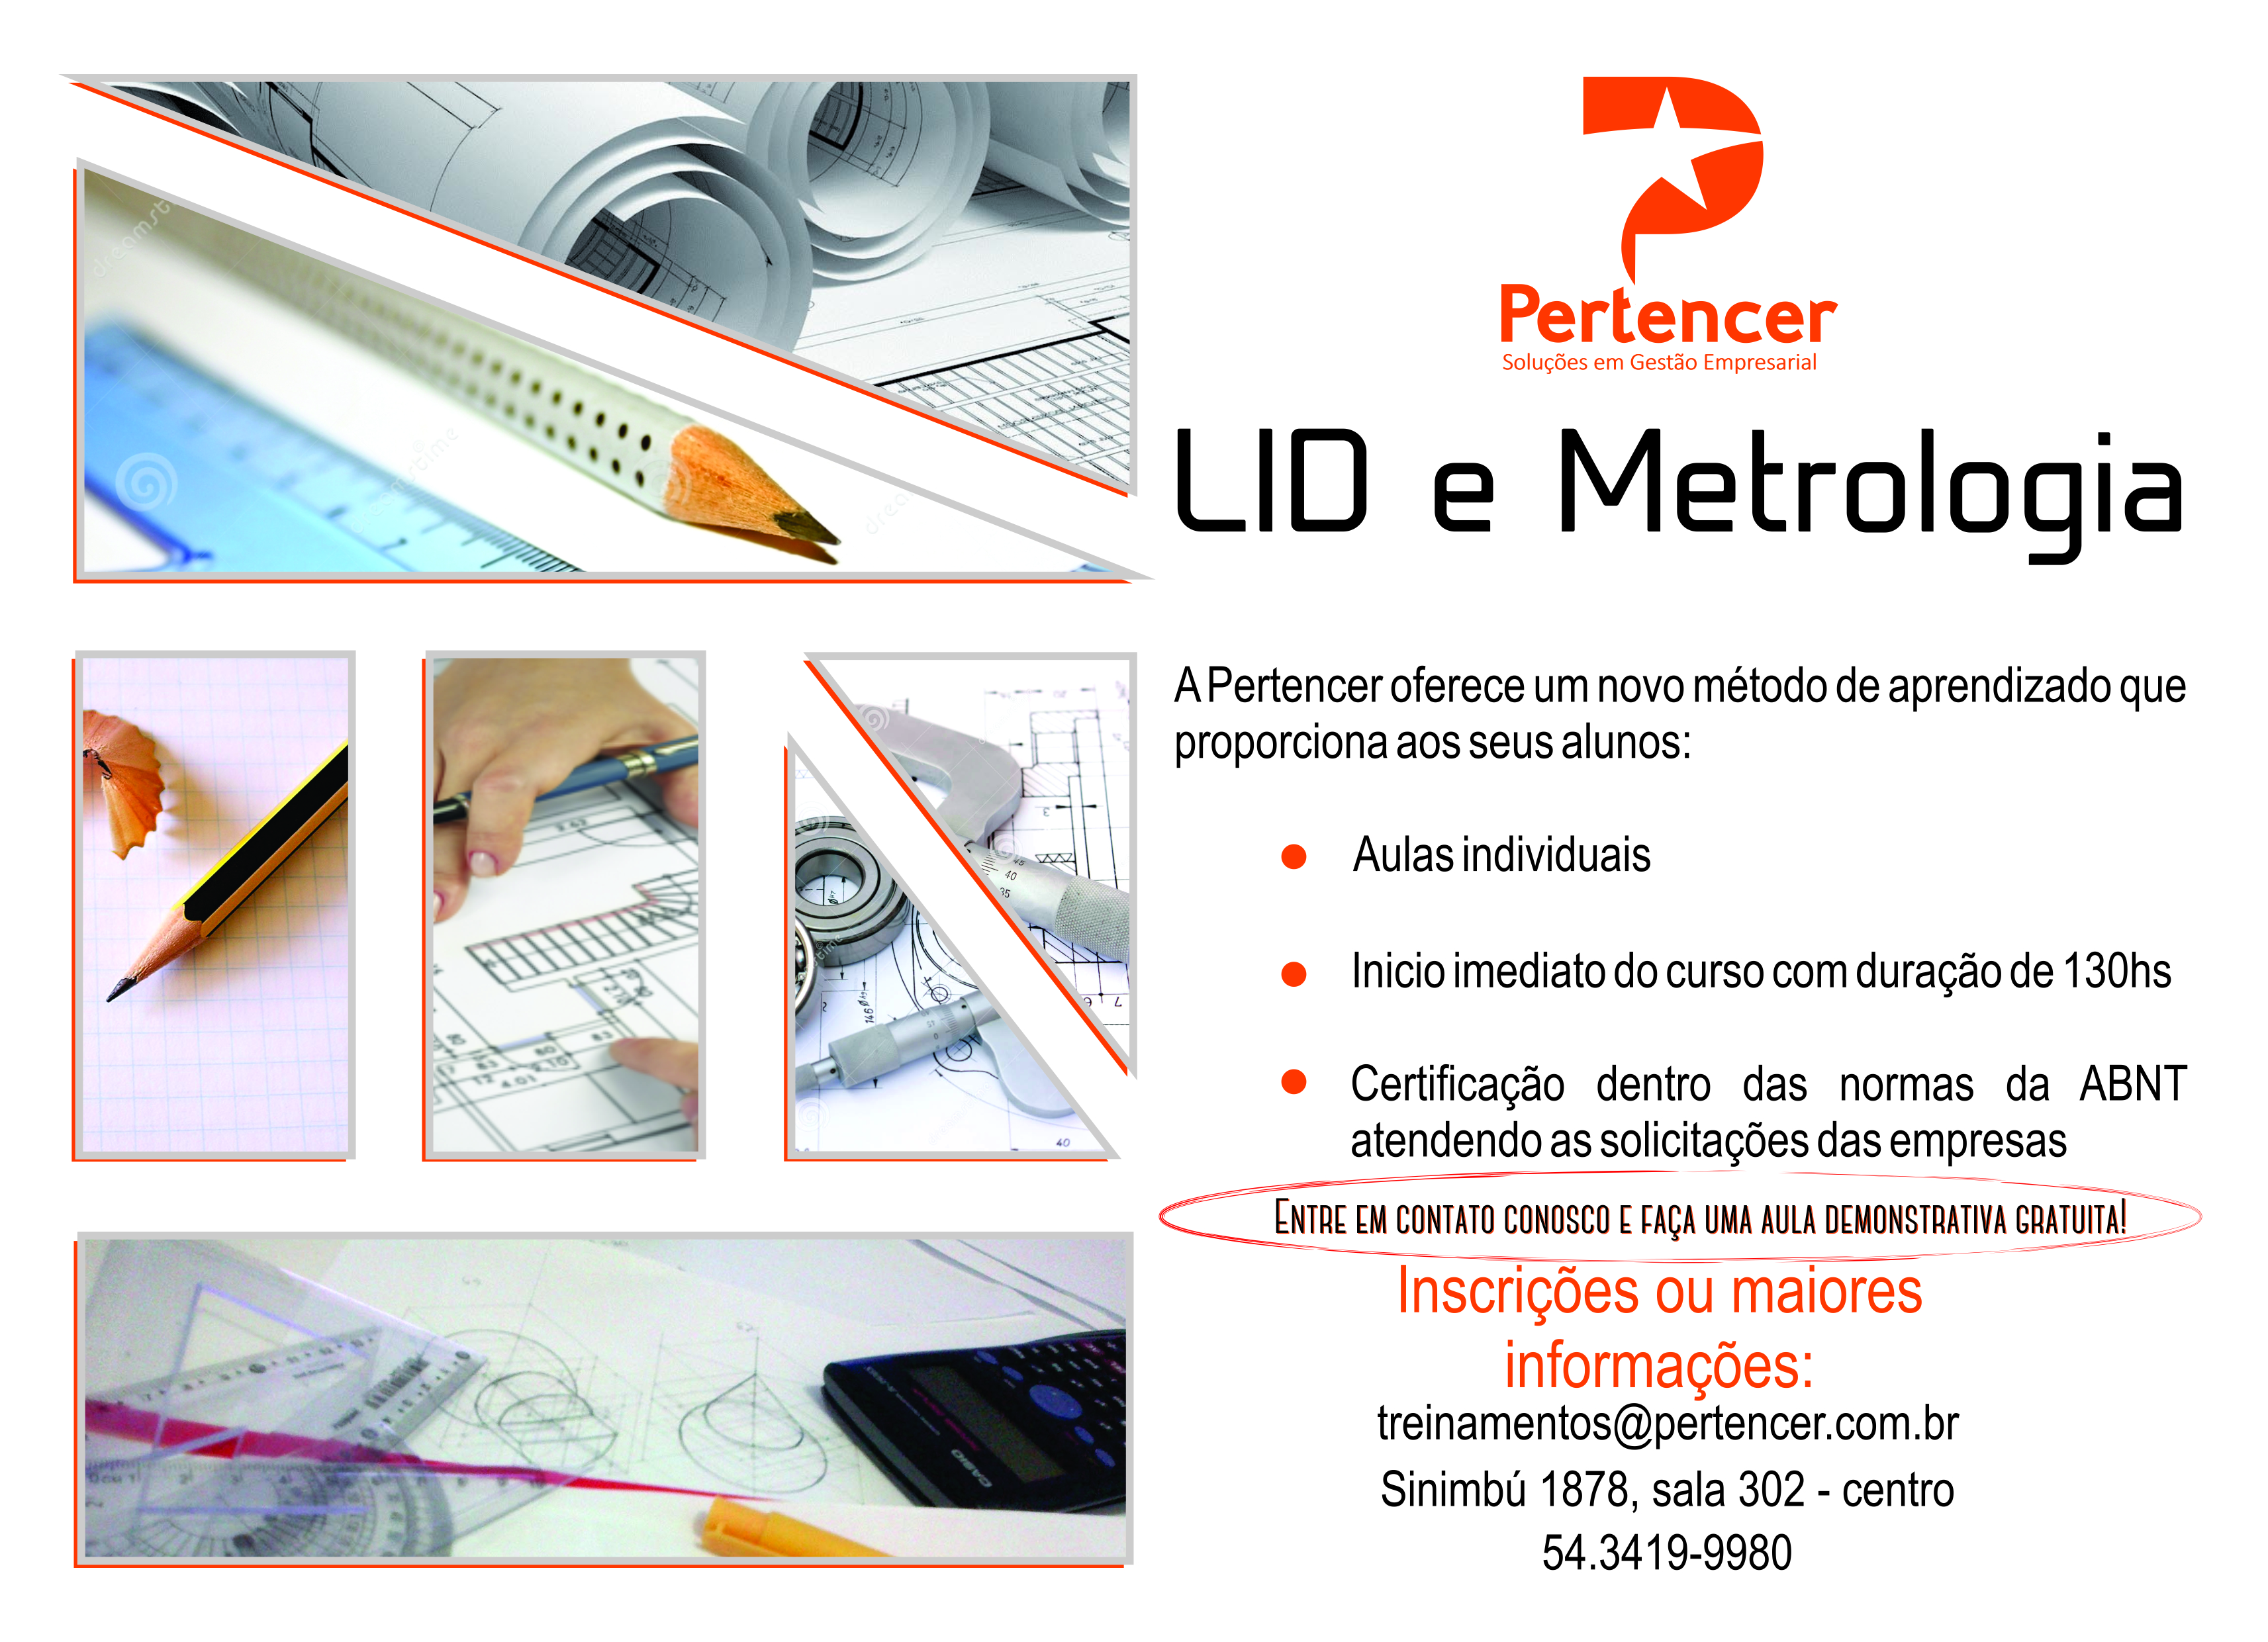 LID e Metrologia